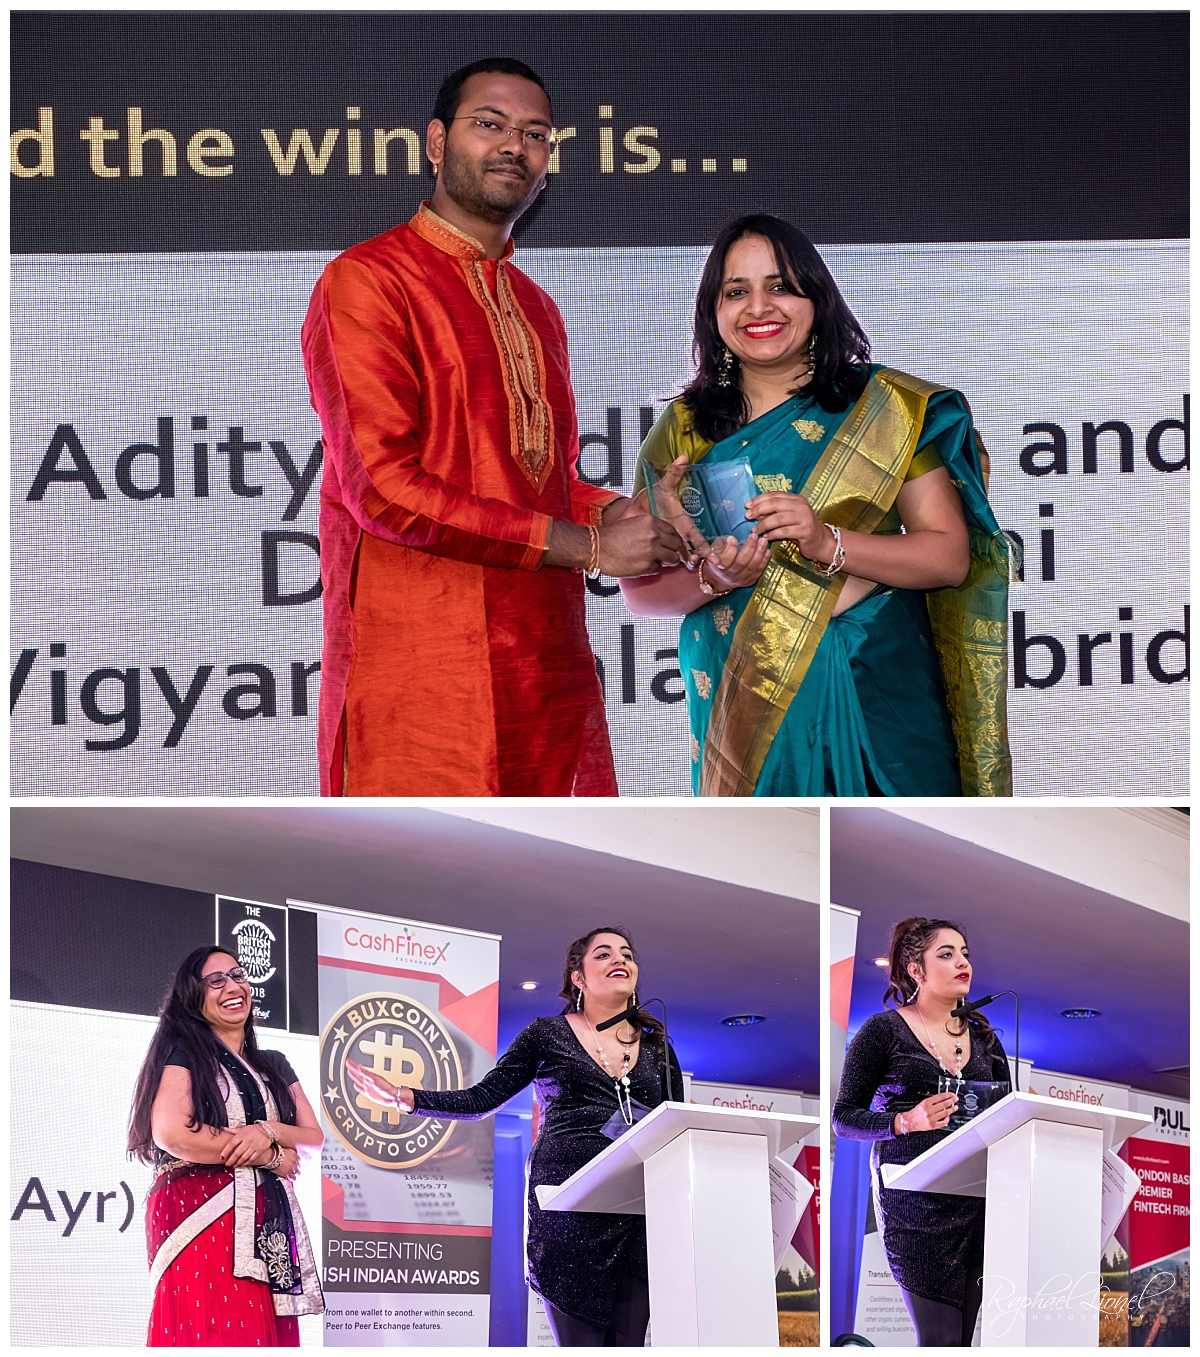 British Indian Awards 2018 24 - British Indian Awards 2018 St Johns Hotel